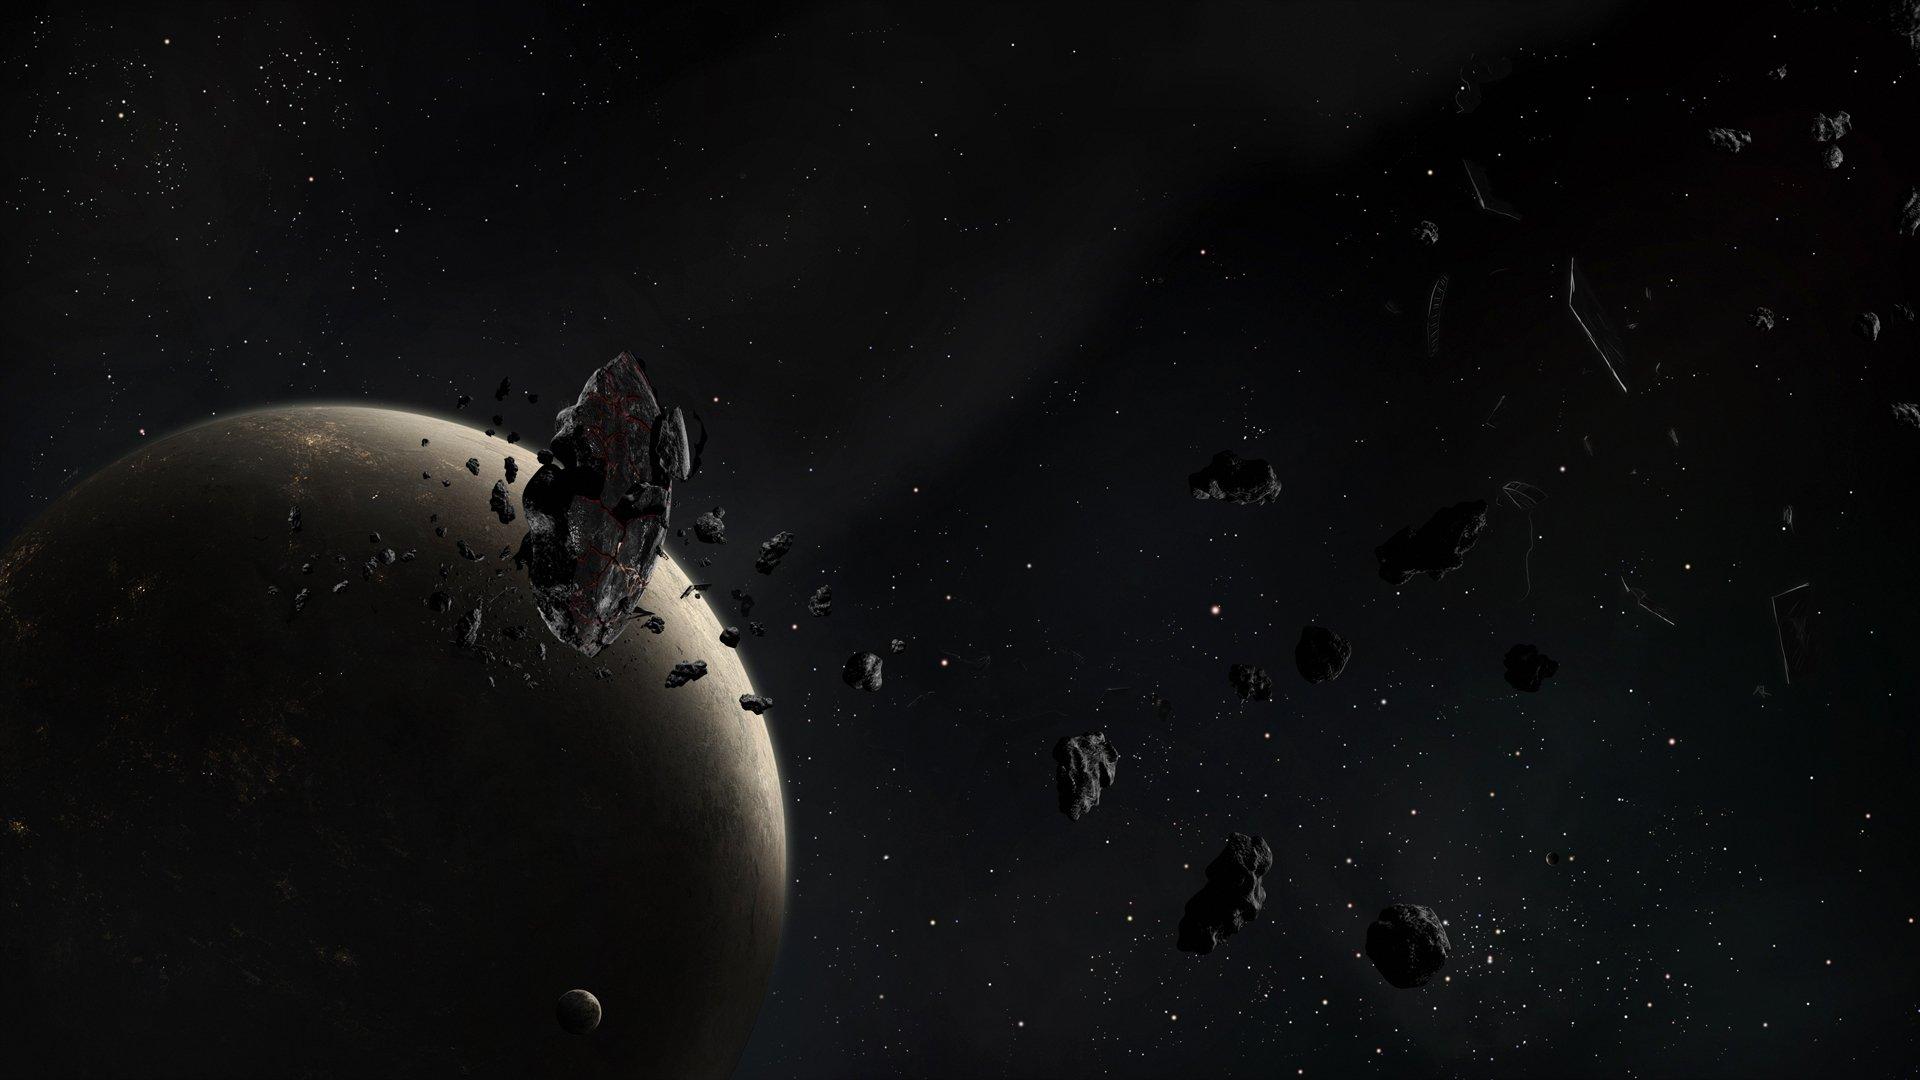 Обои обломки, астероиды, земля. Космос foto 12